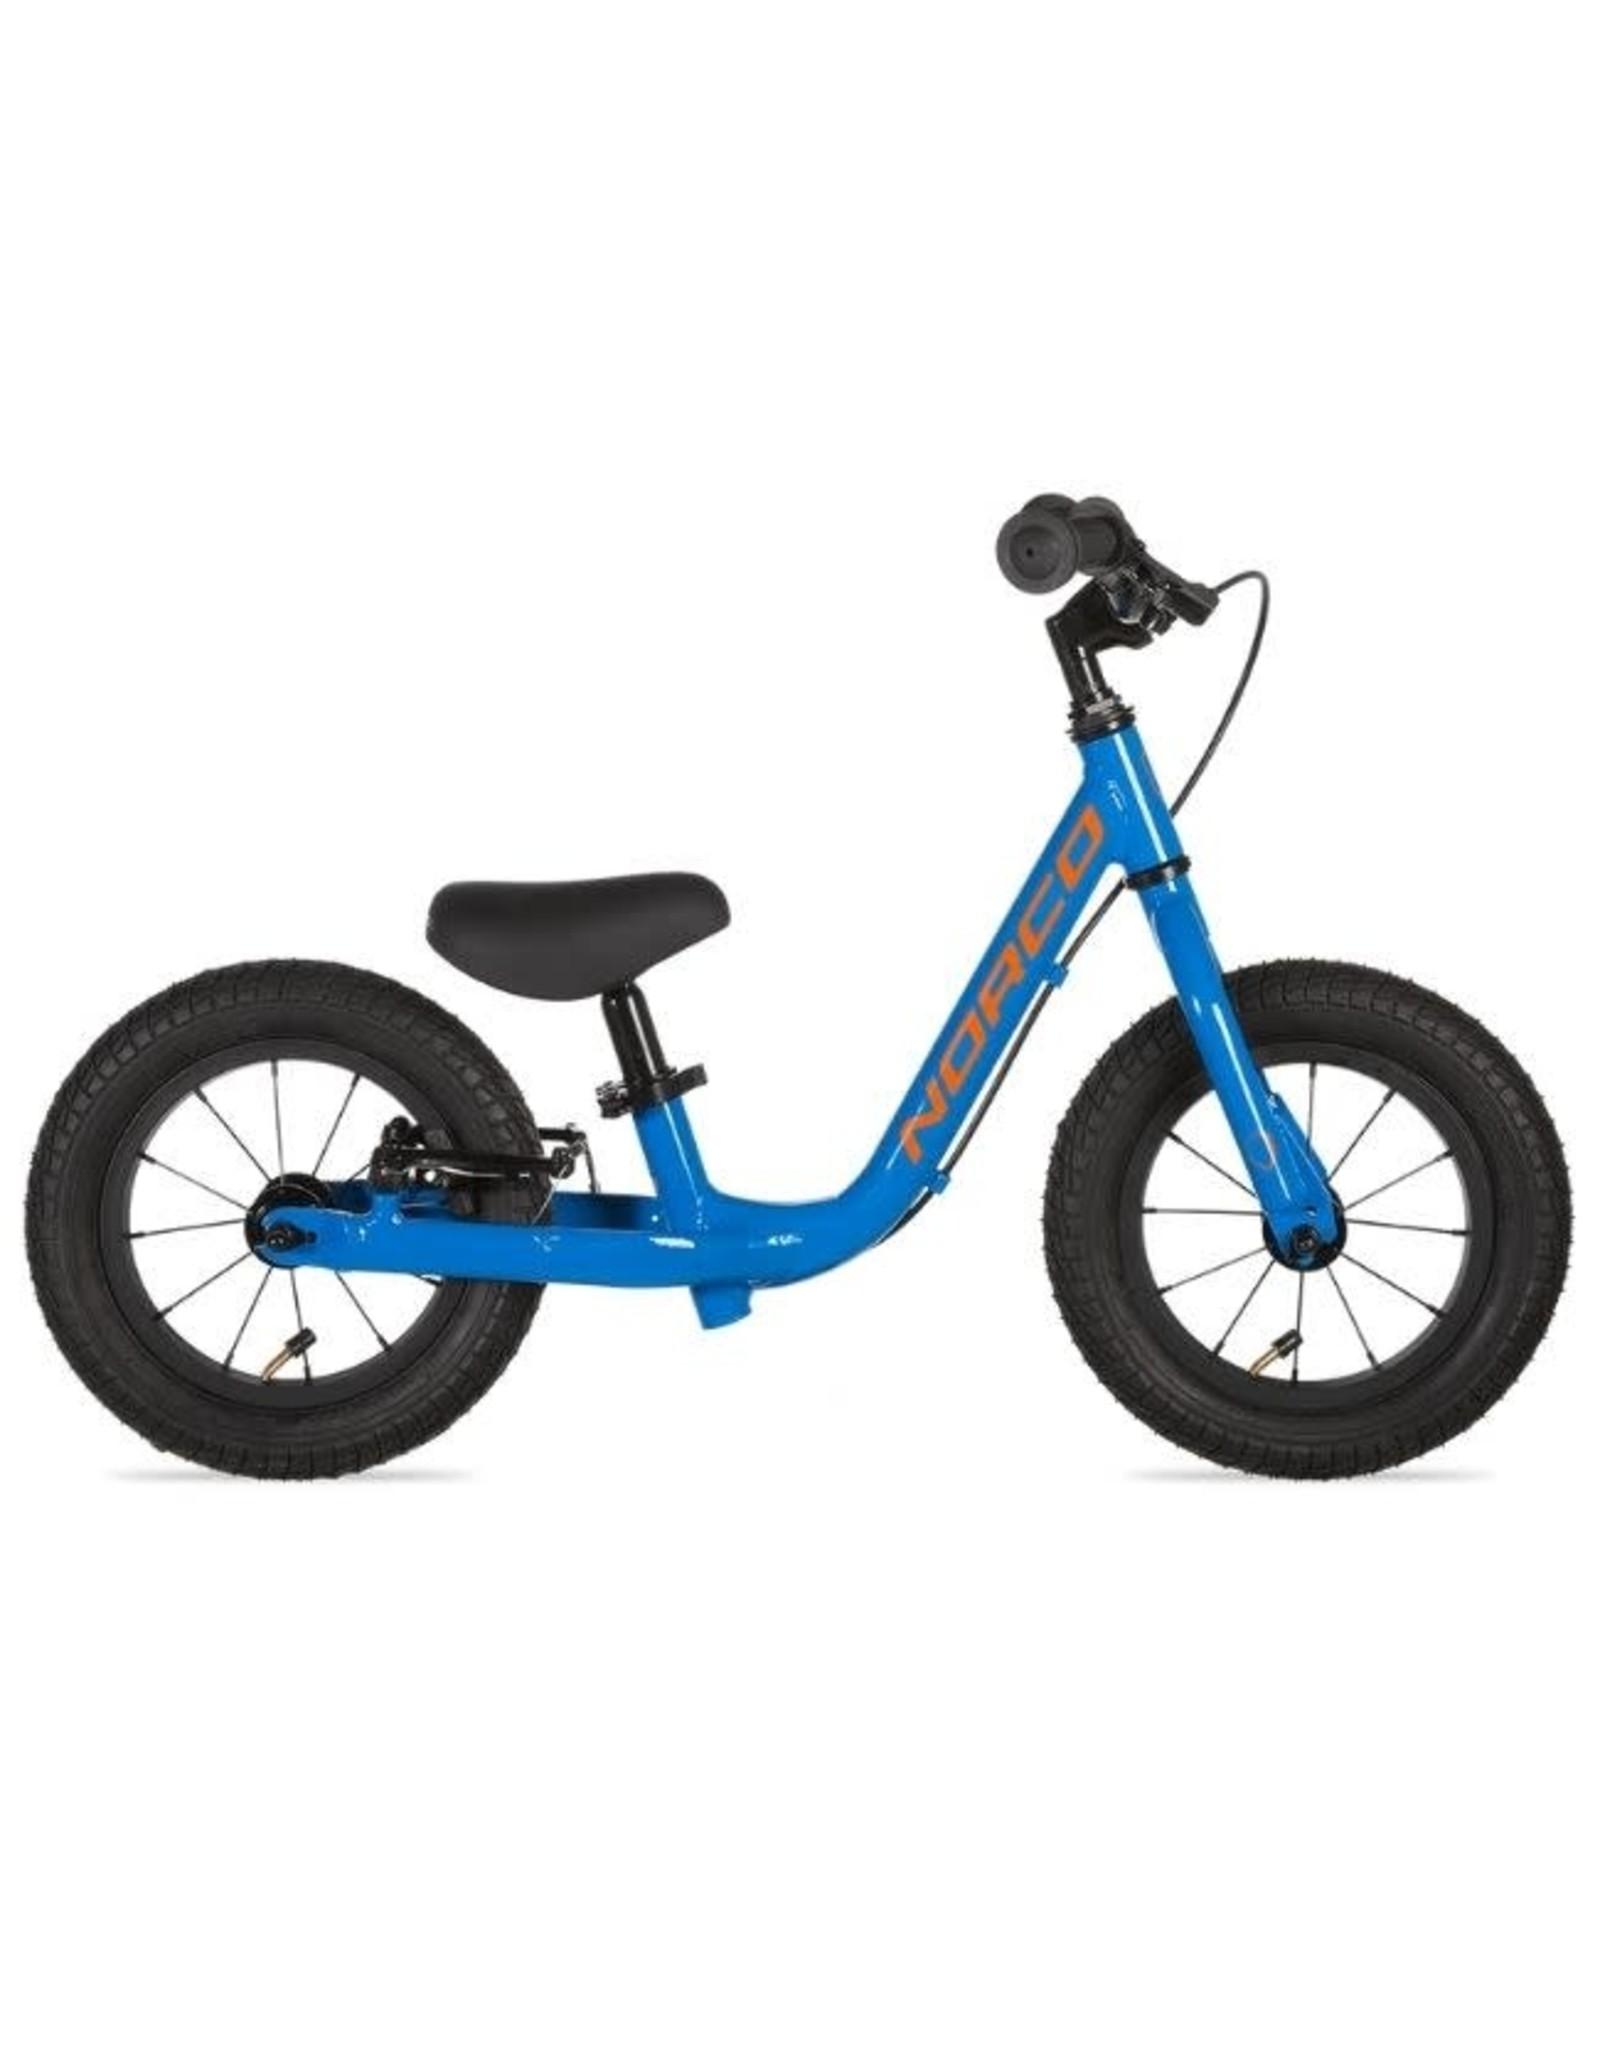 Norco 2021 Norco Runner 12 BLUE/ORANGE 12